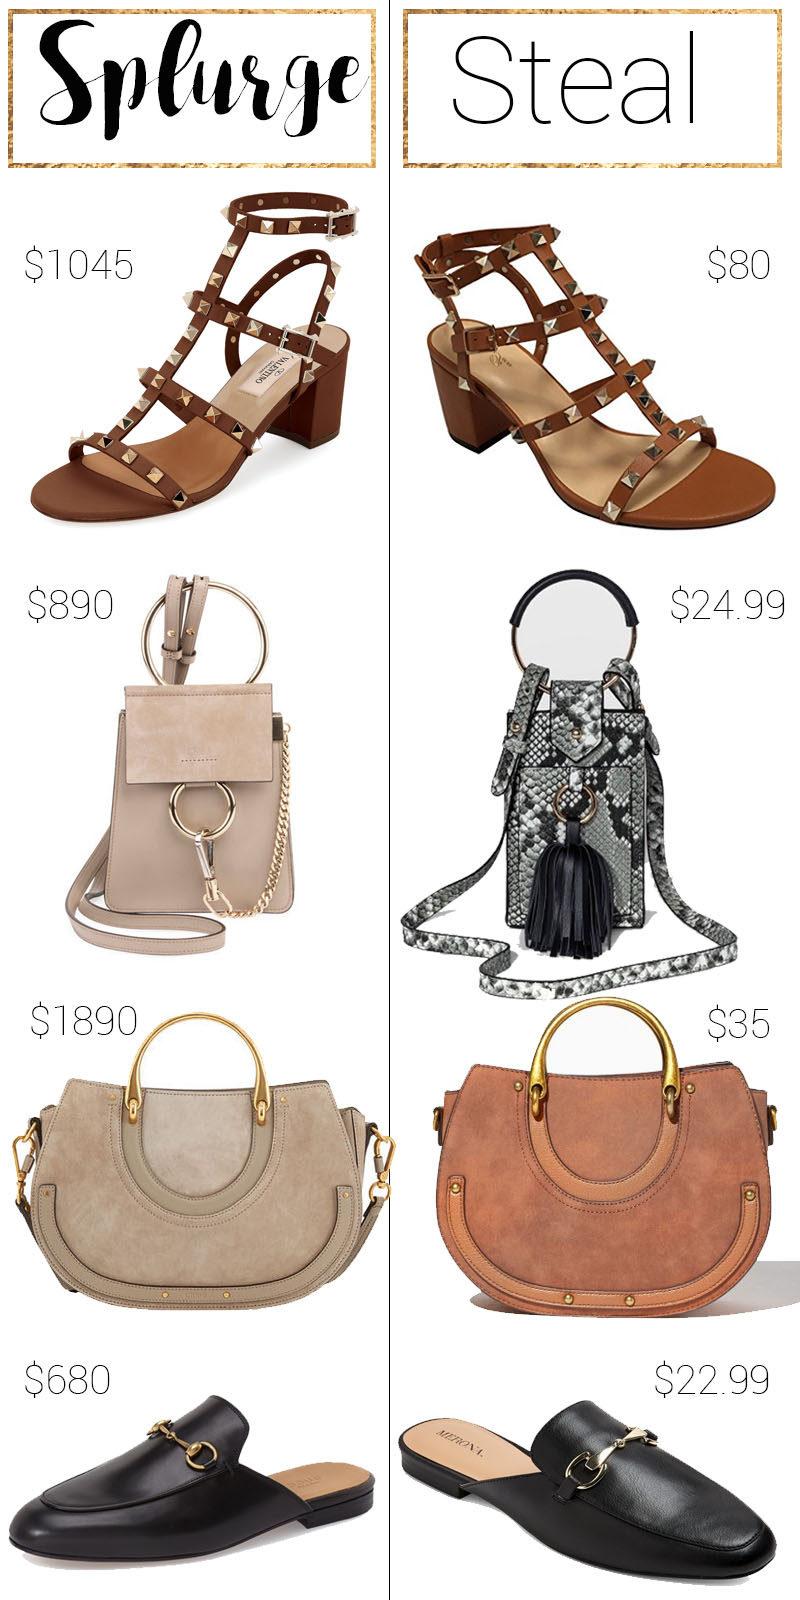 Splurge vs Steal Shoes designer dupes for fall 2017